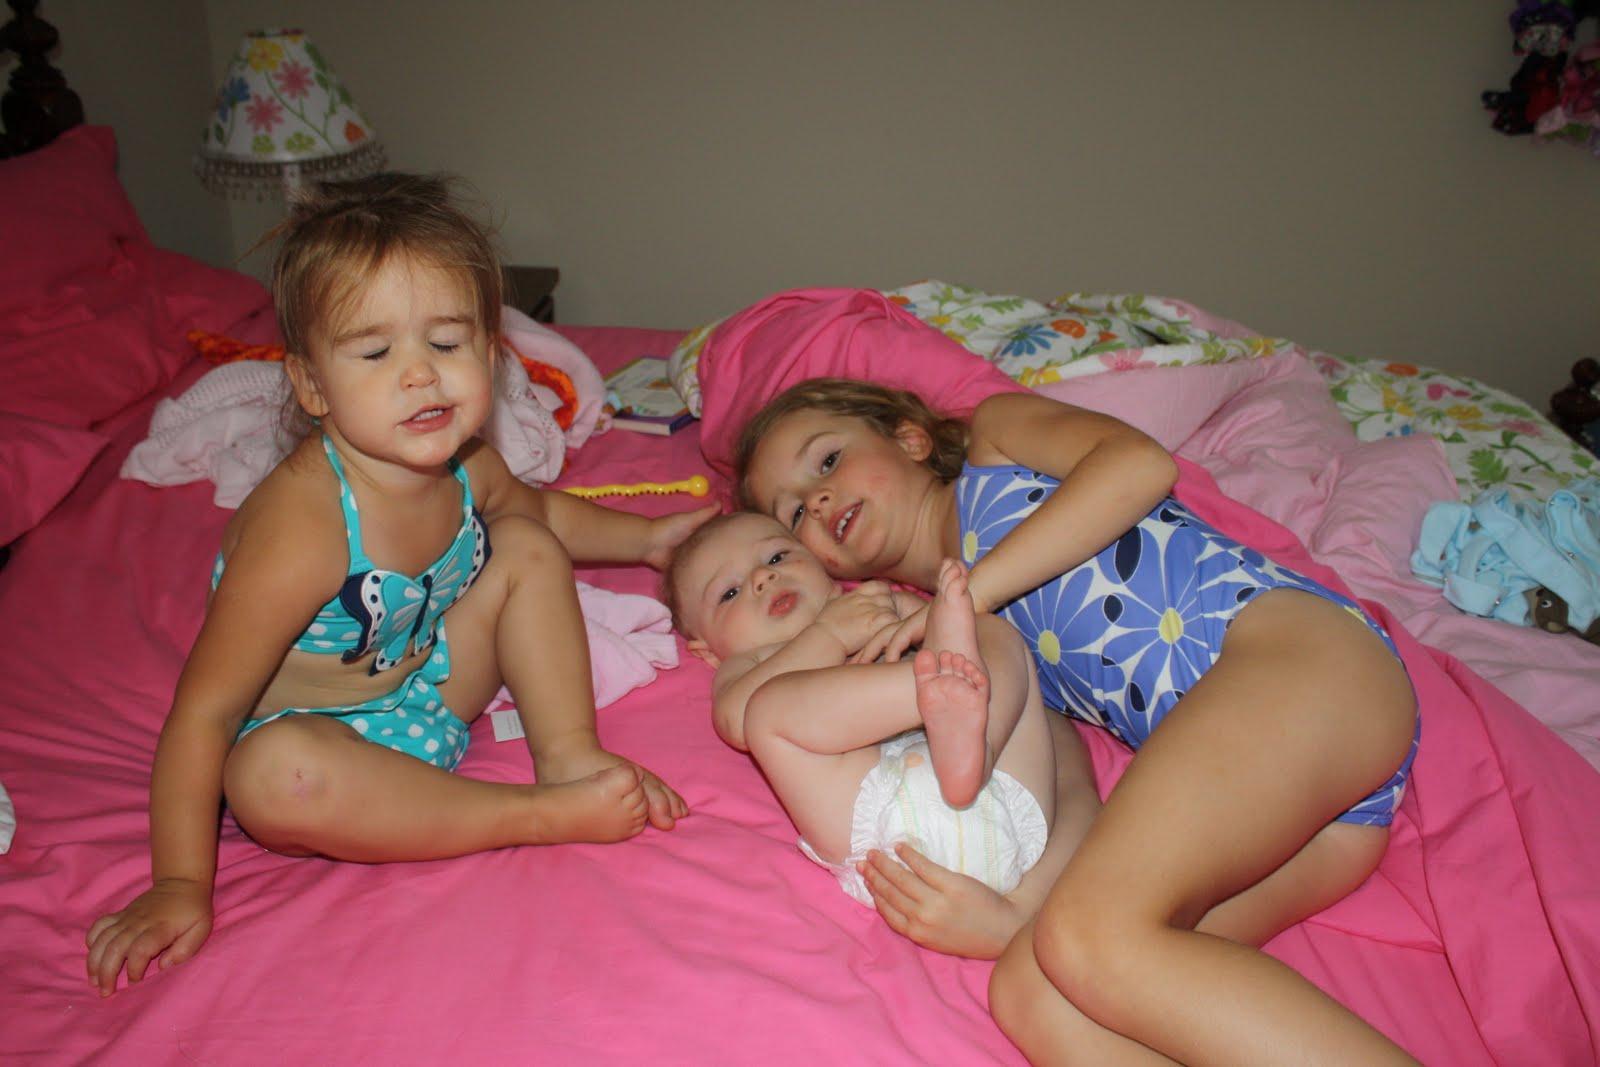 the girls kissing c good morning little girls are sooo sweet